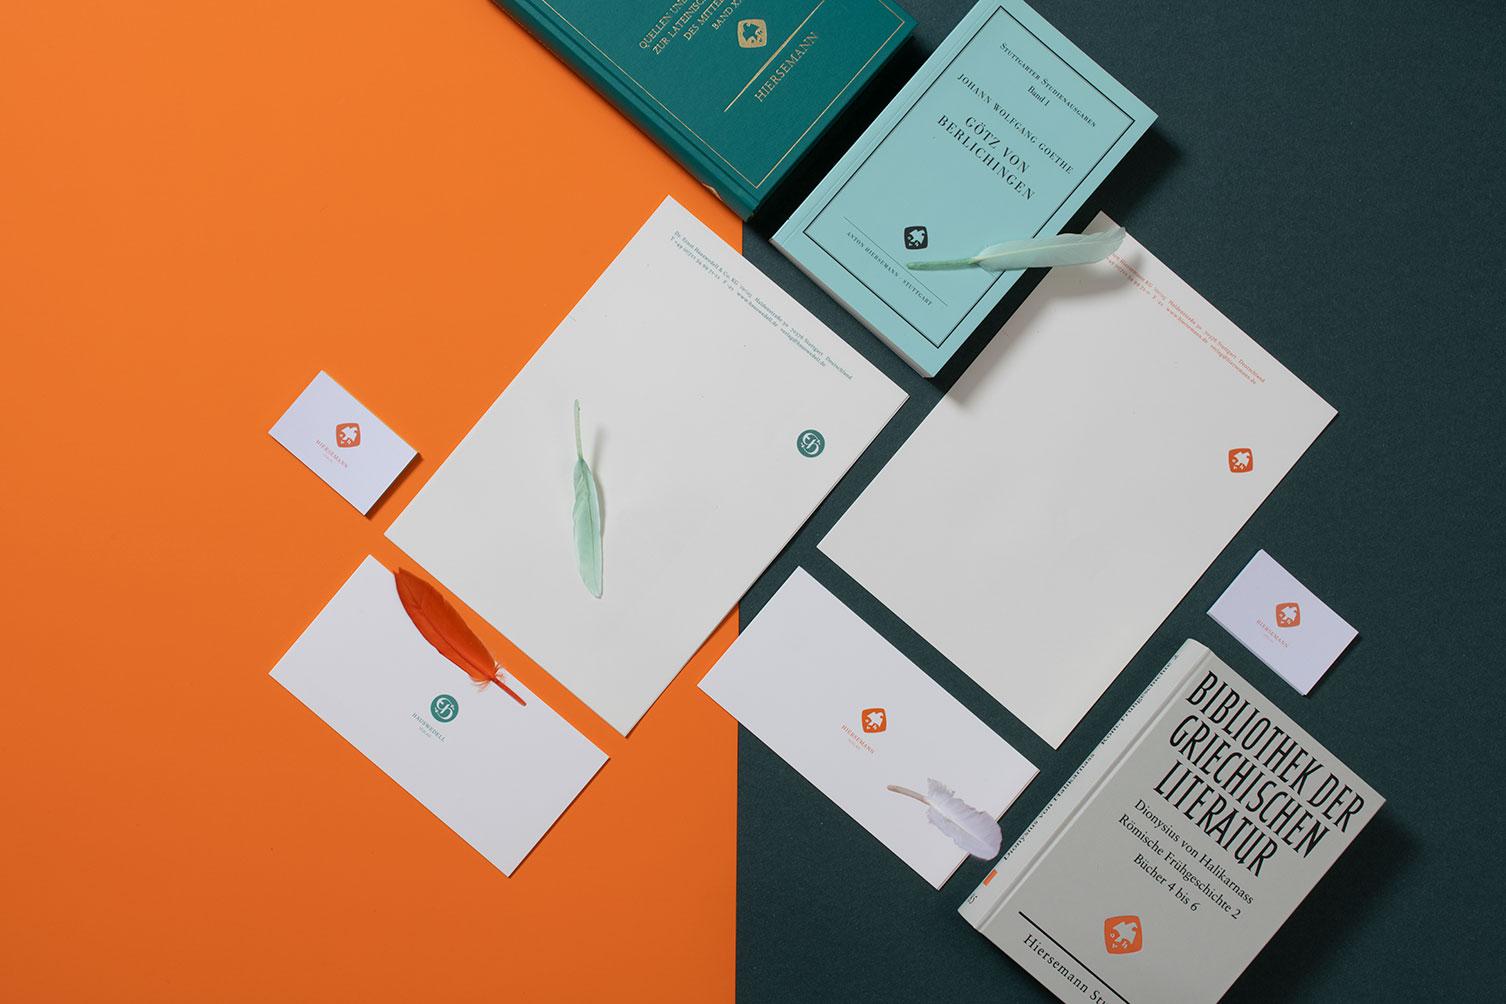 Hiersemann, Hauswedell, Verlag, Stuttgart, Redesign, Logo, Corporate Design